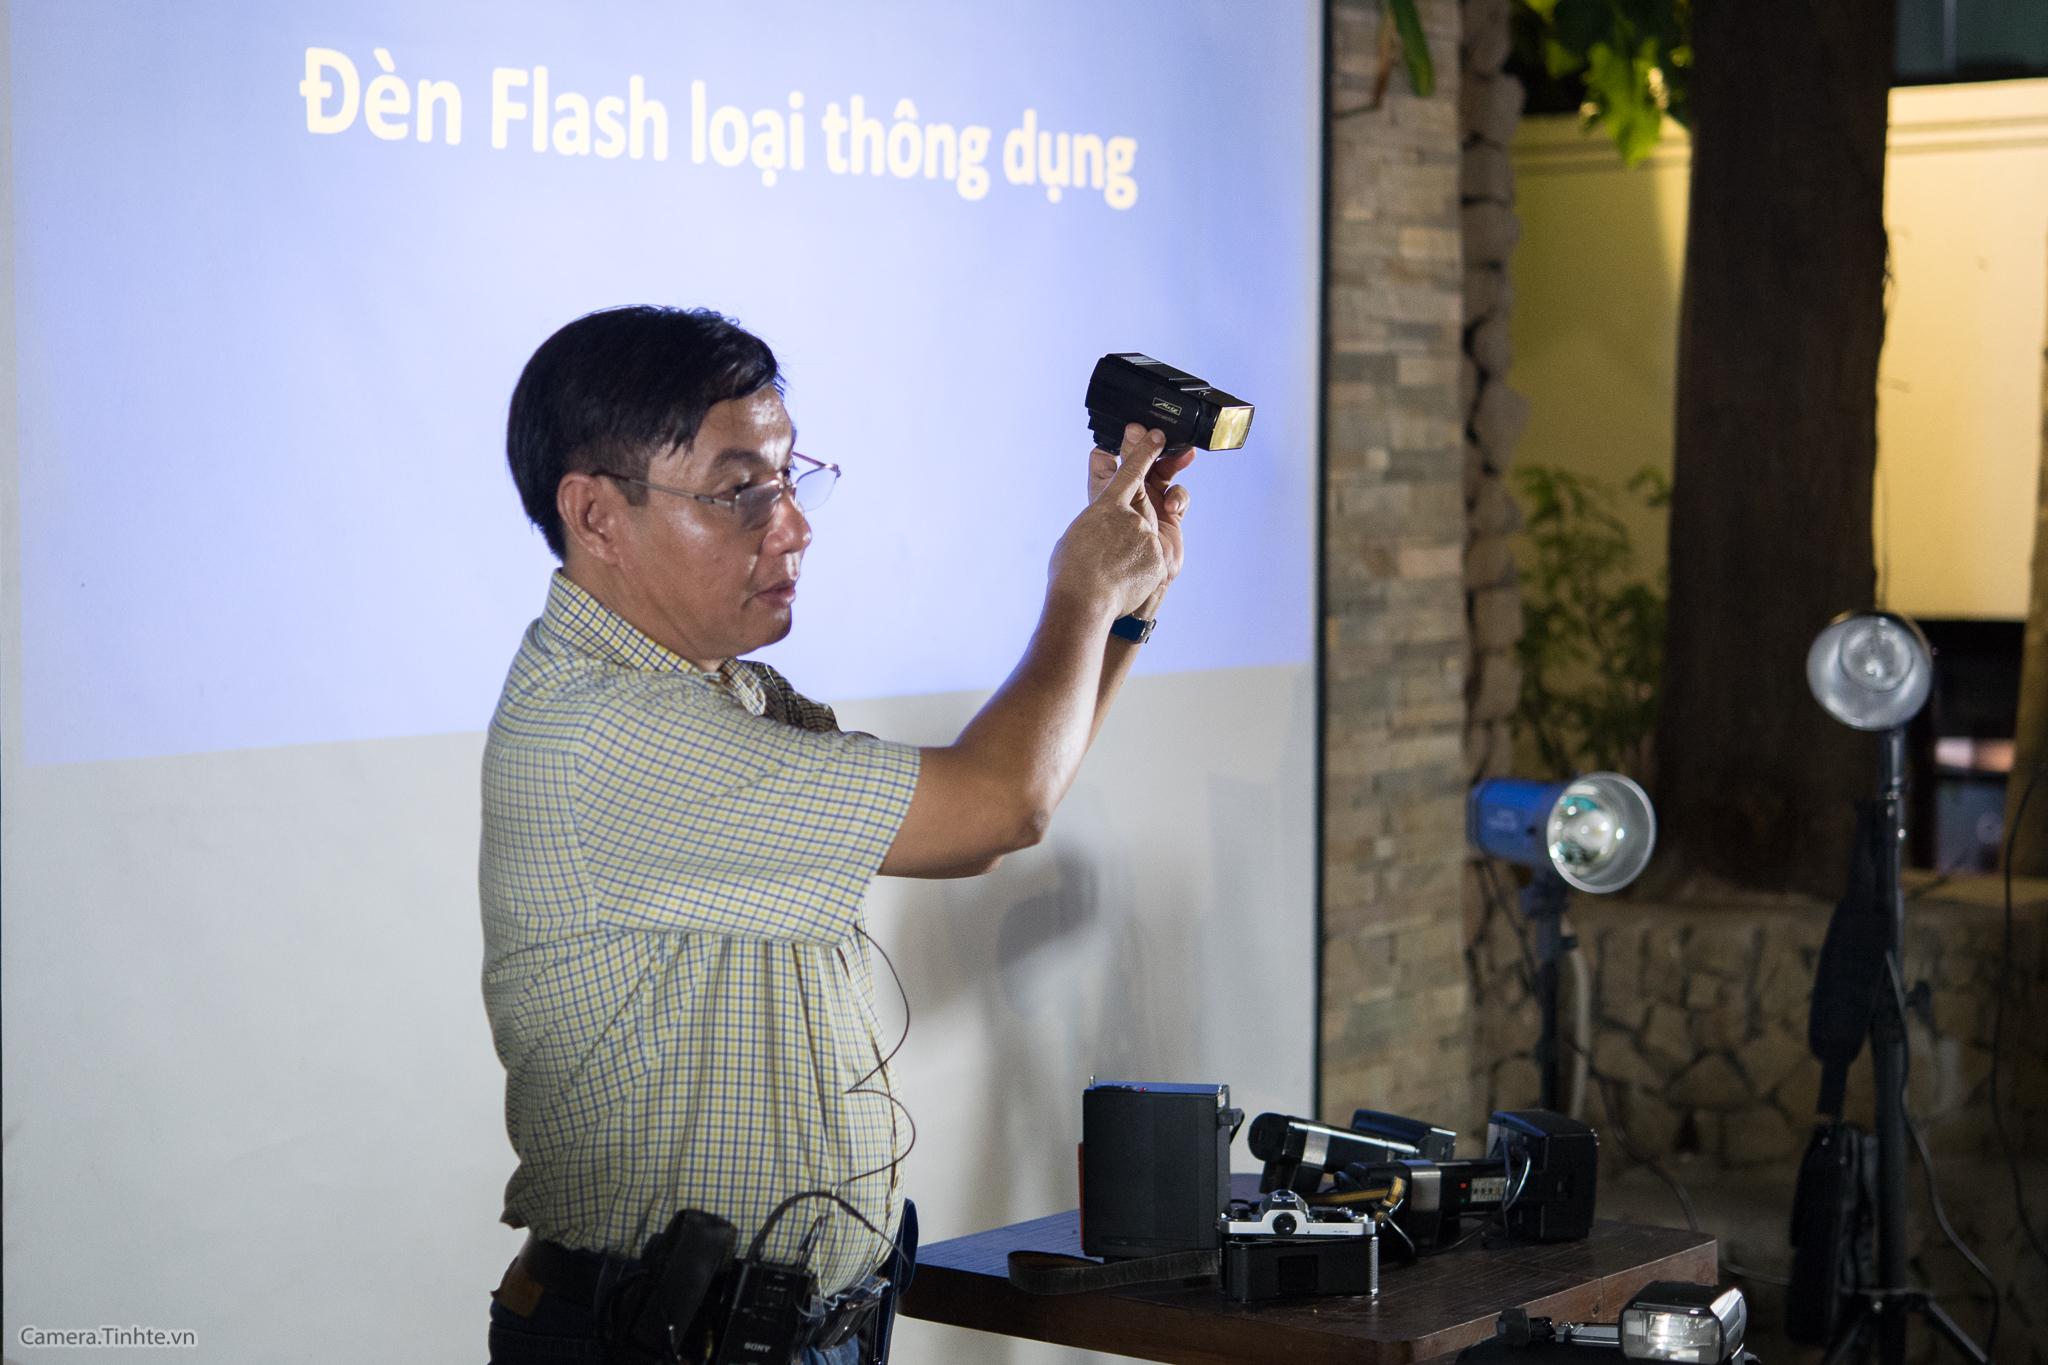 NACB 5 - Flash - Camera.tinhte.vn-8.jpg